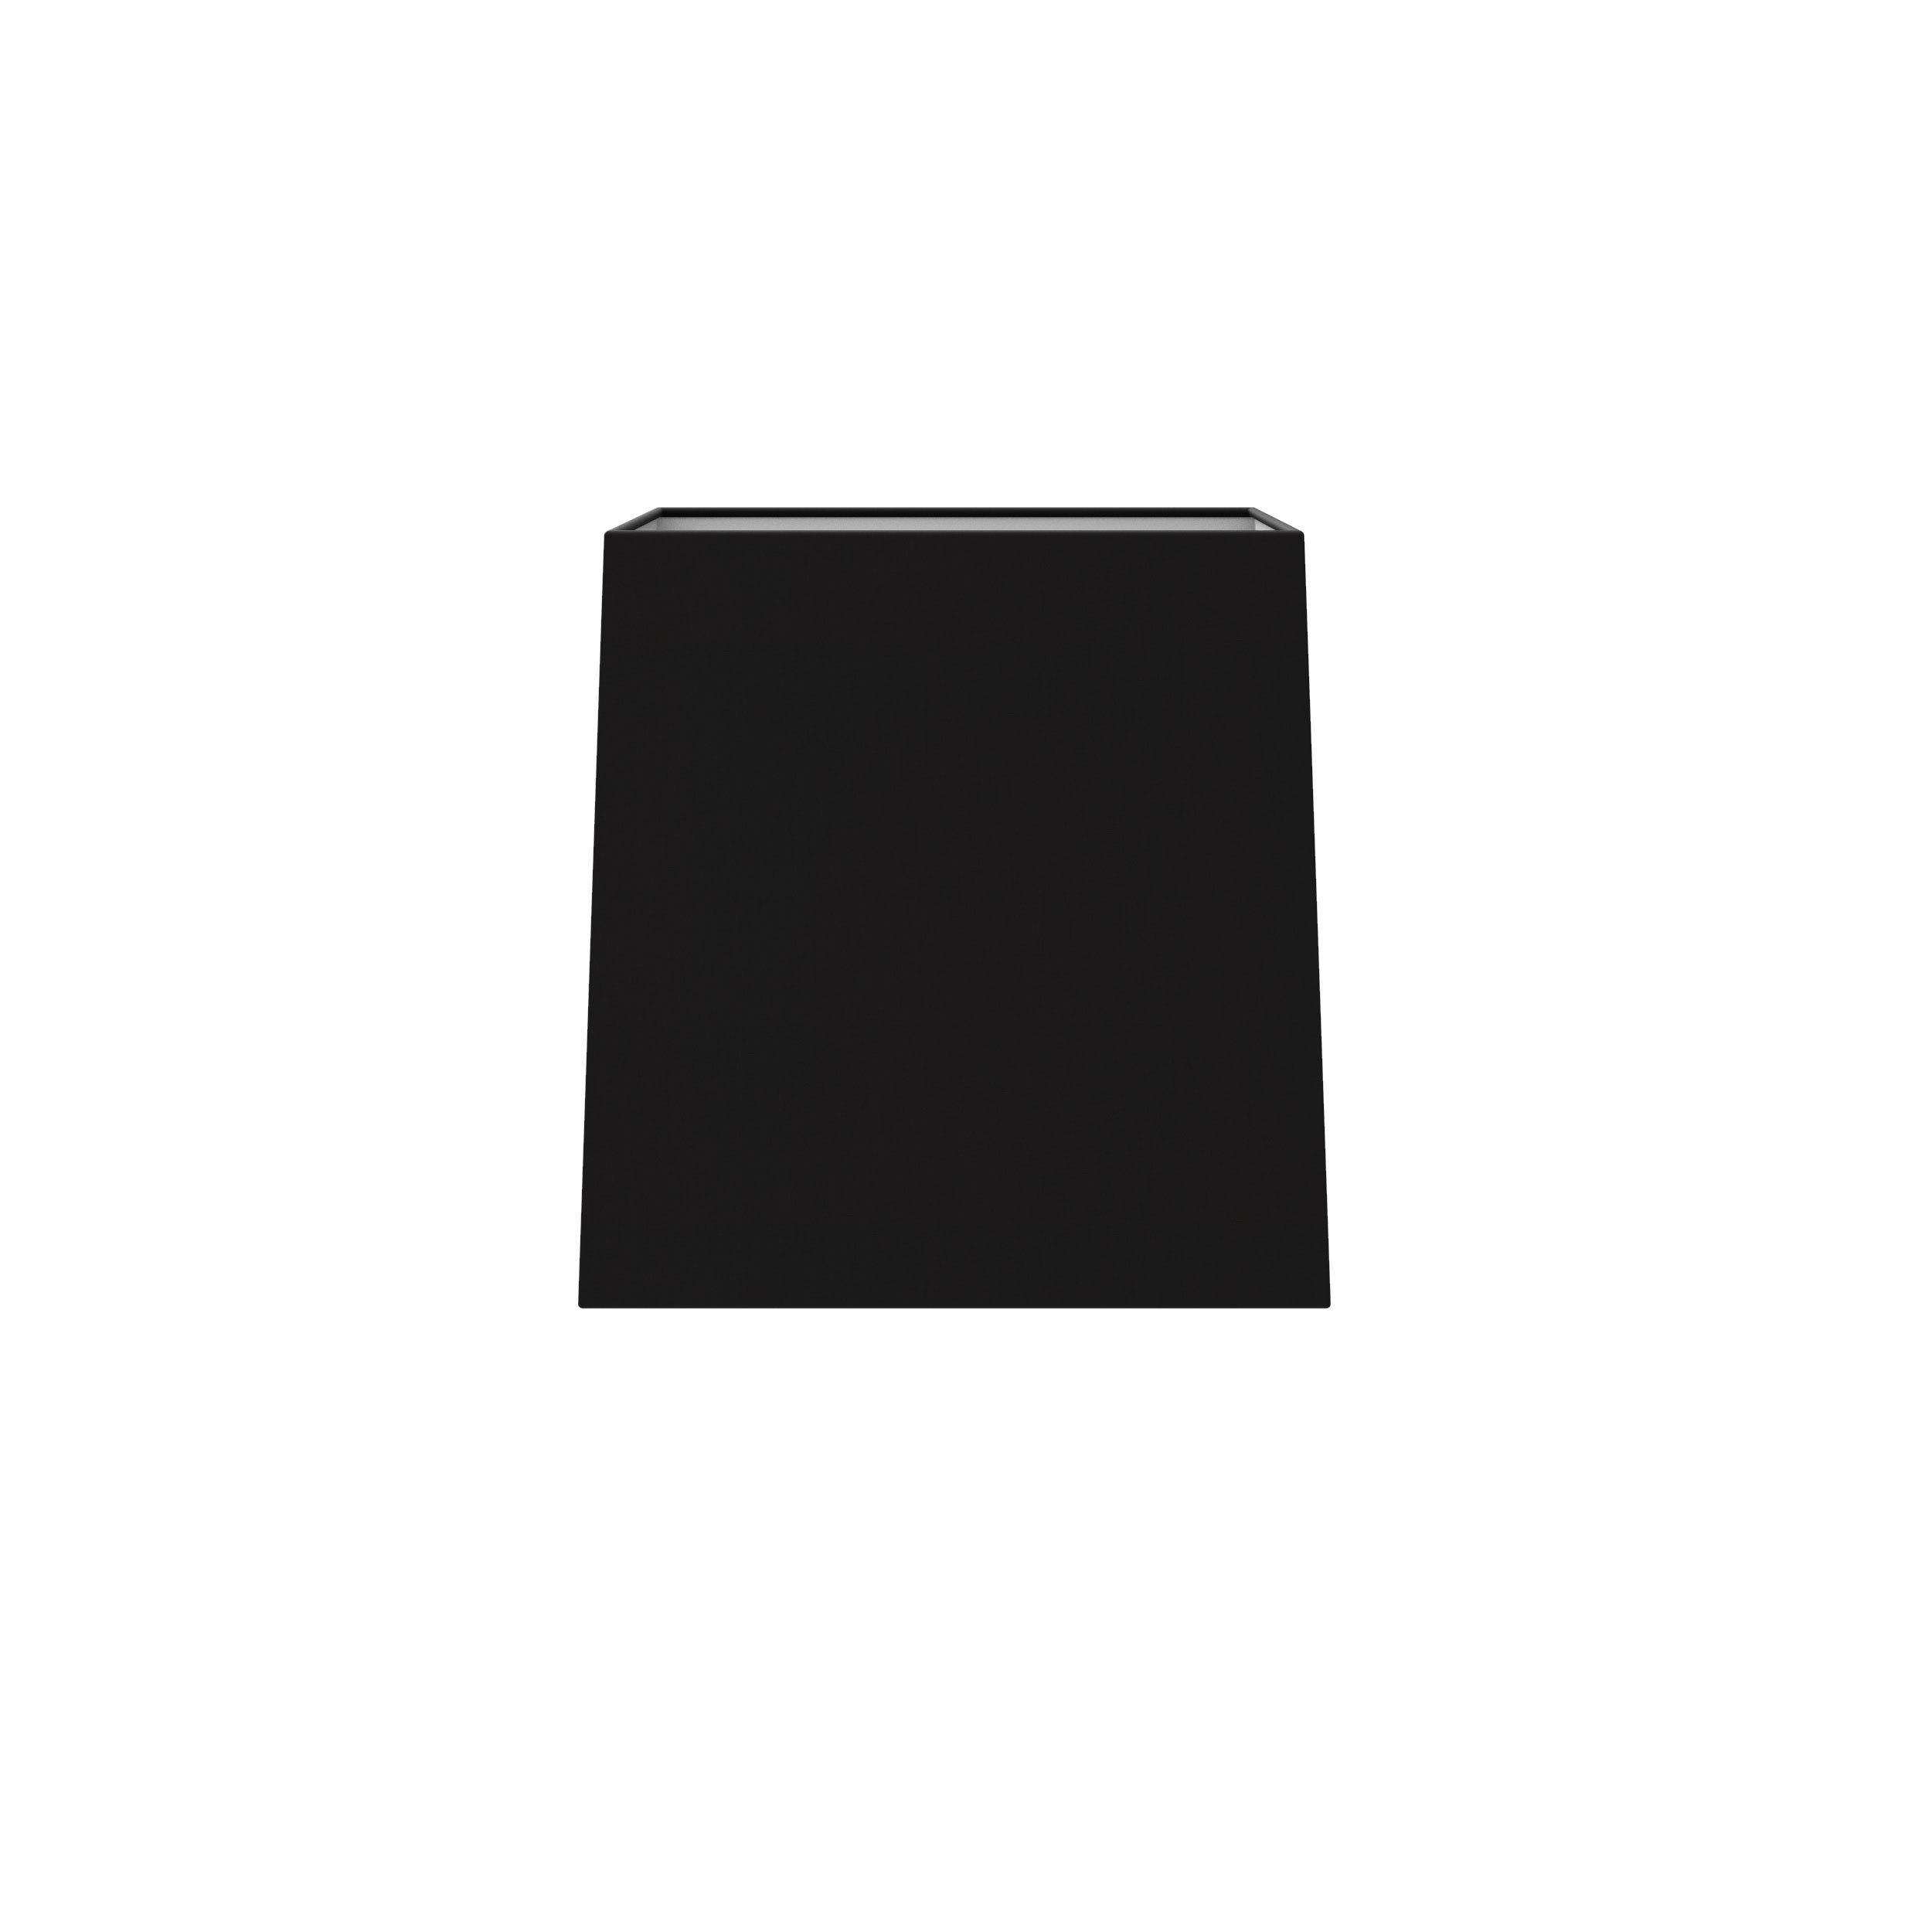 Абажур Astro Tapered Square 5005002 (4019), черный, текстиль - фото 1